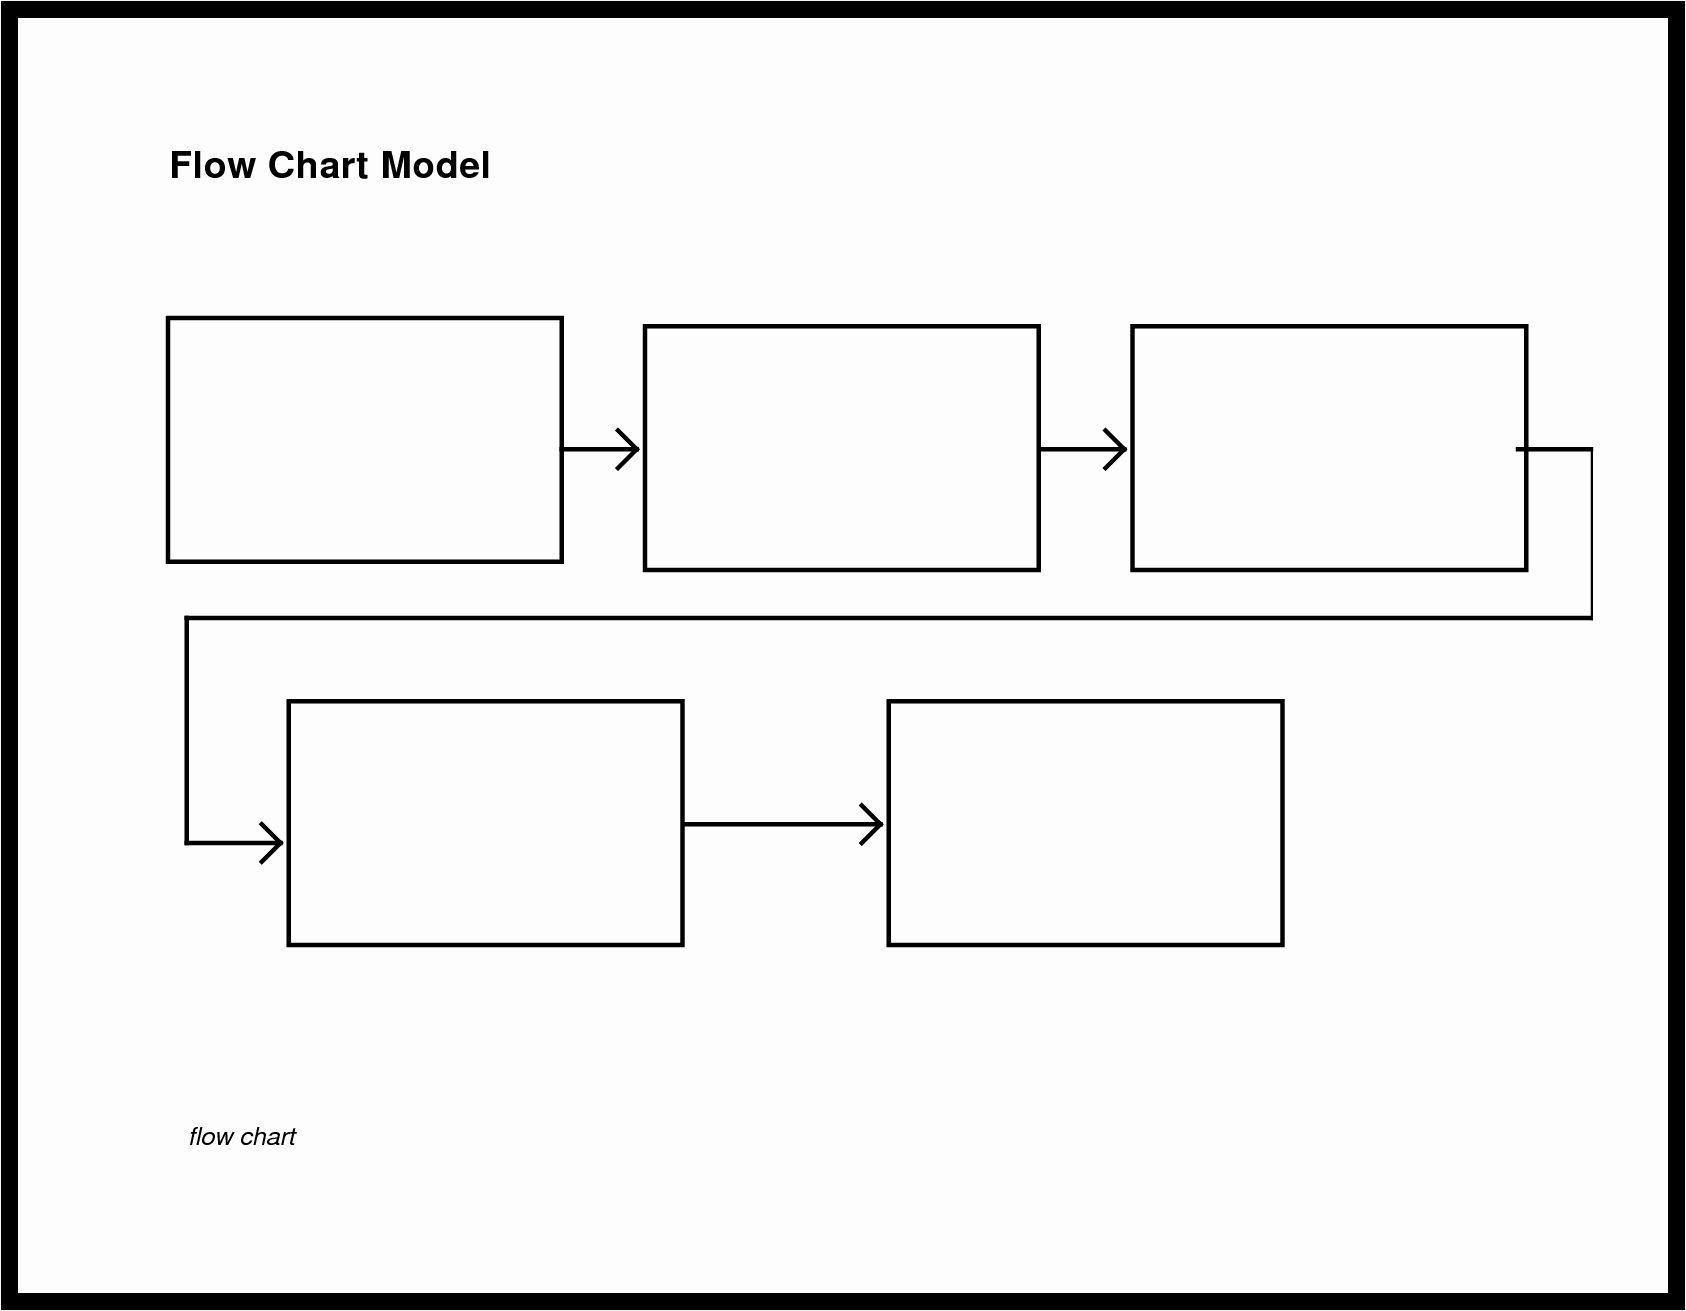 Blank Flowchart Template Lovely Flow Chart Template For Kids Shopgrat Basic Sample Flow Chart Template Work Flow Chart Flow Map